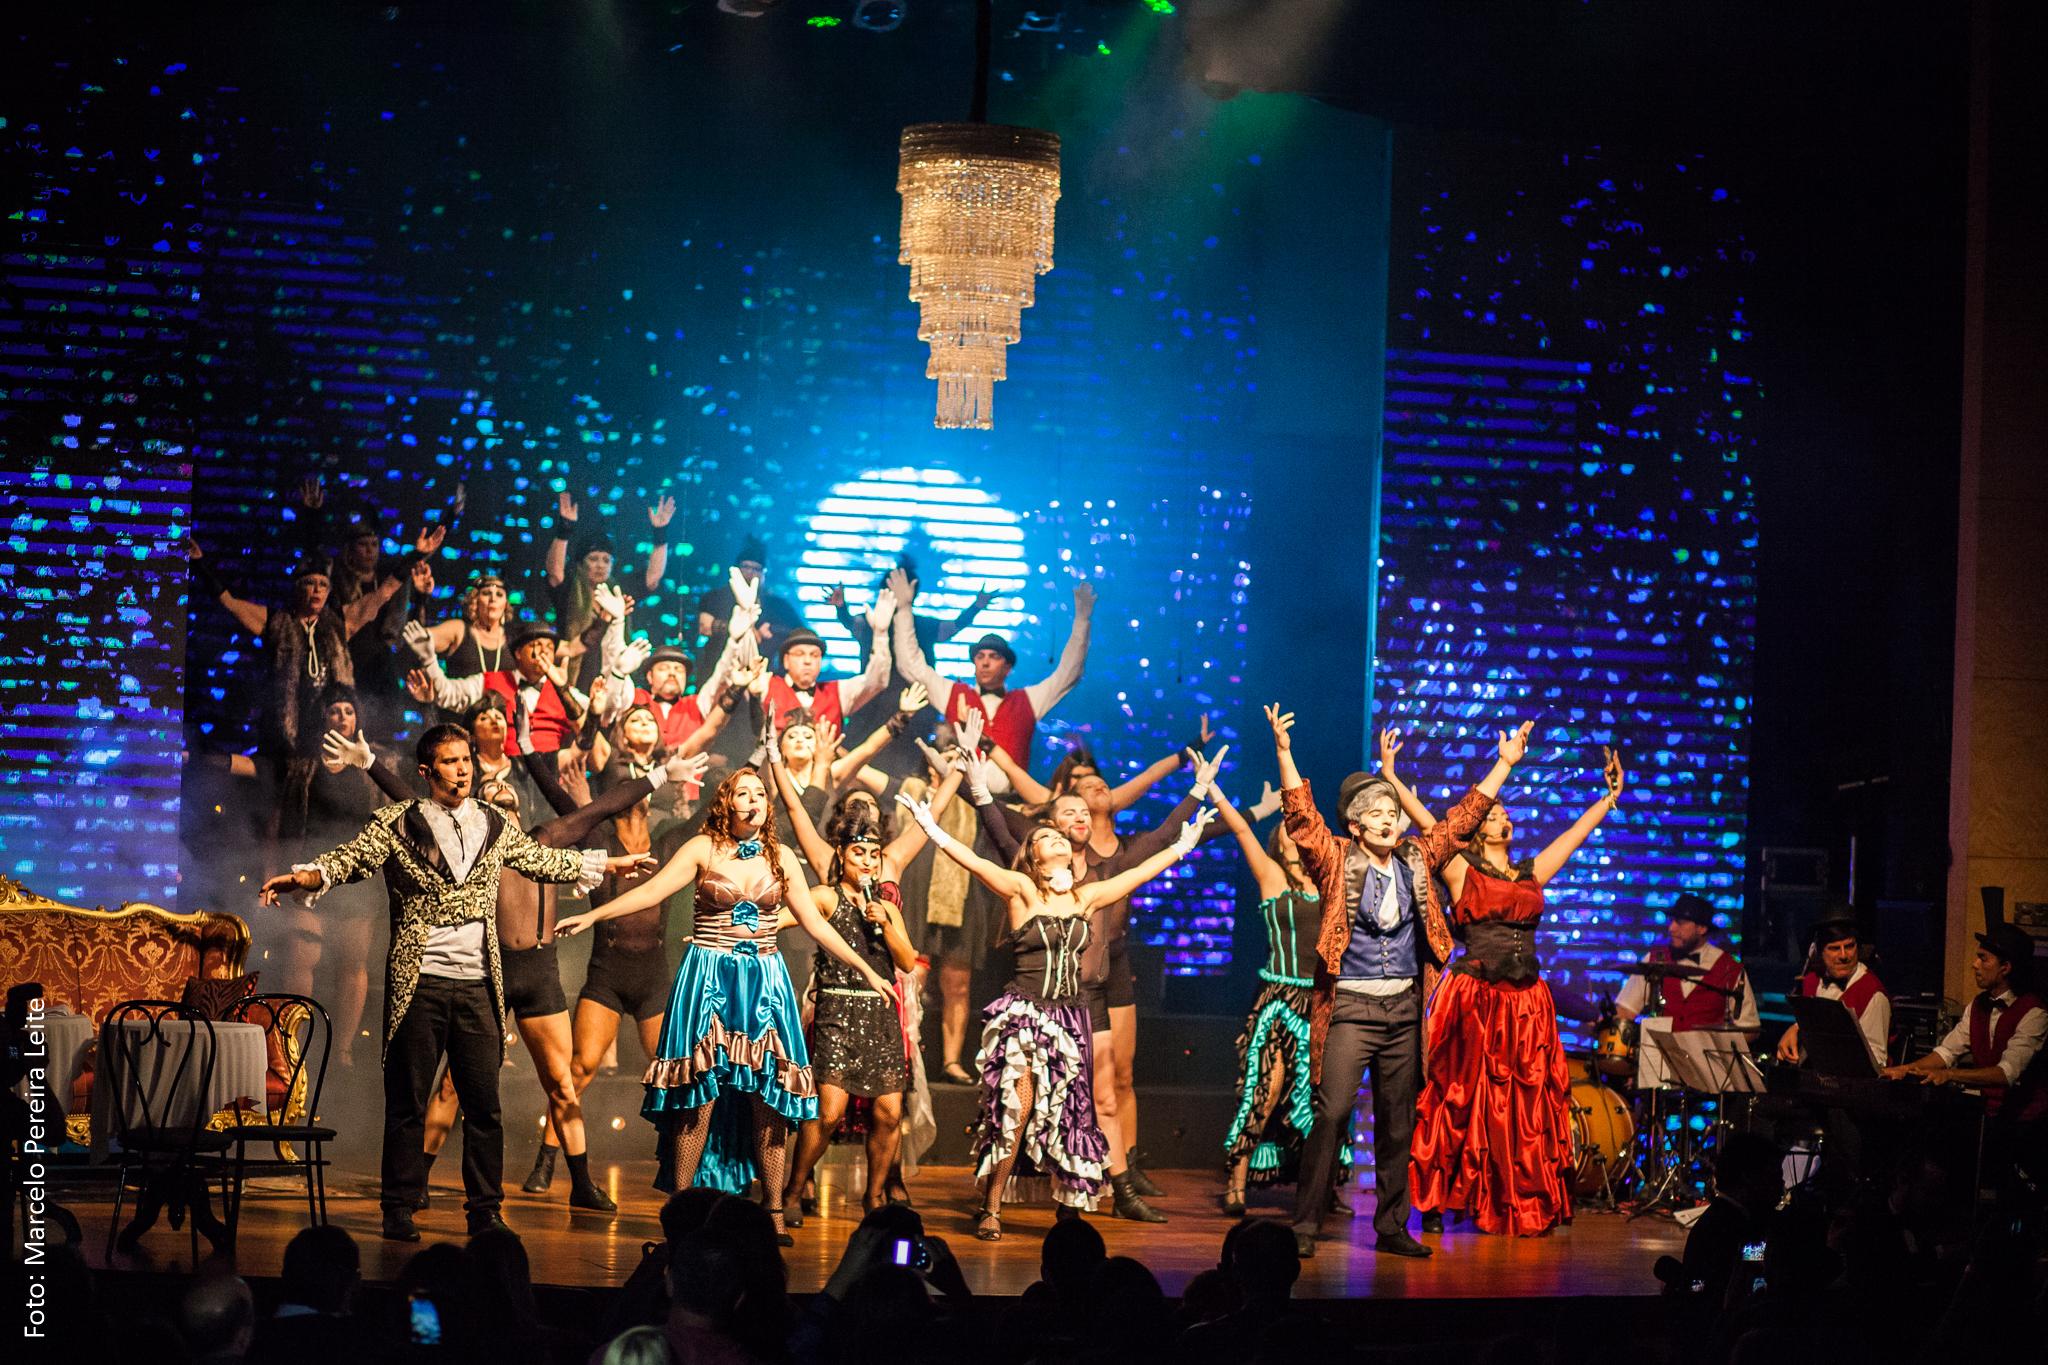 Tour com a peça Cabaret La Mour 2016